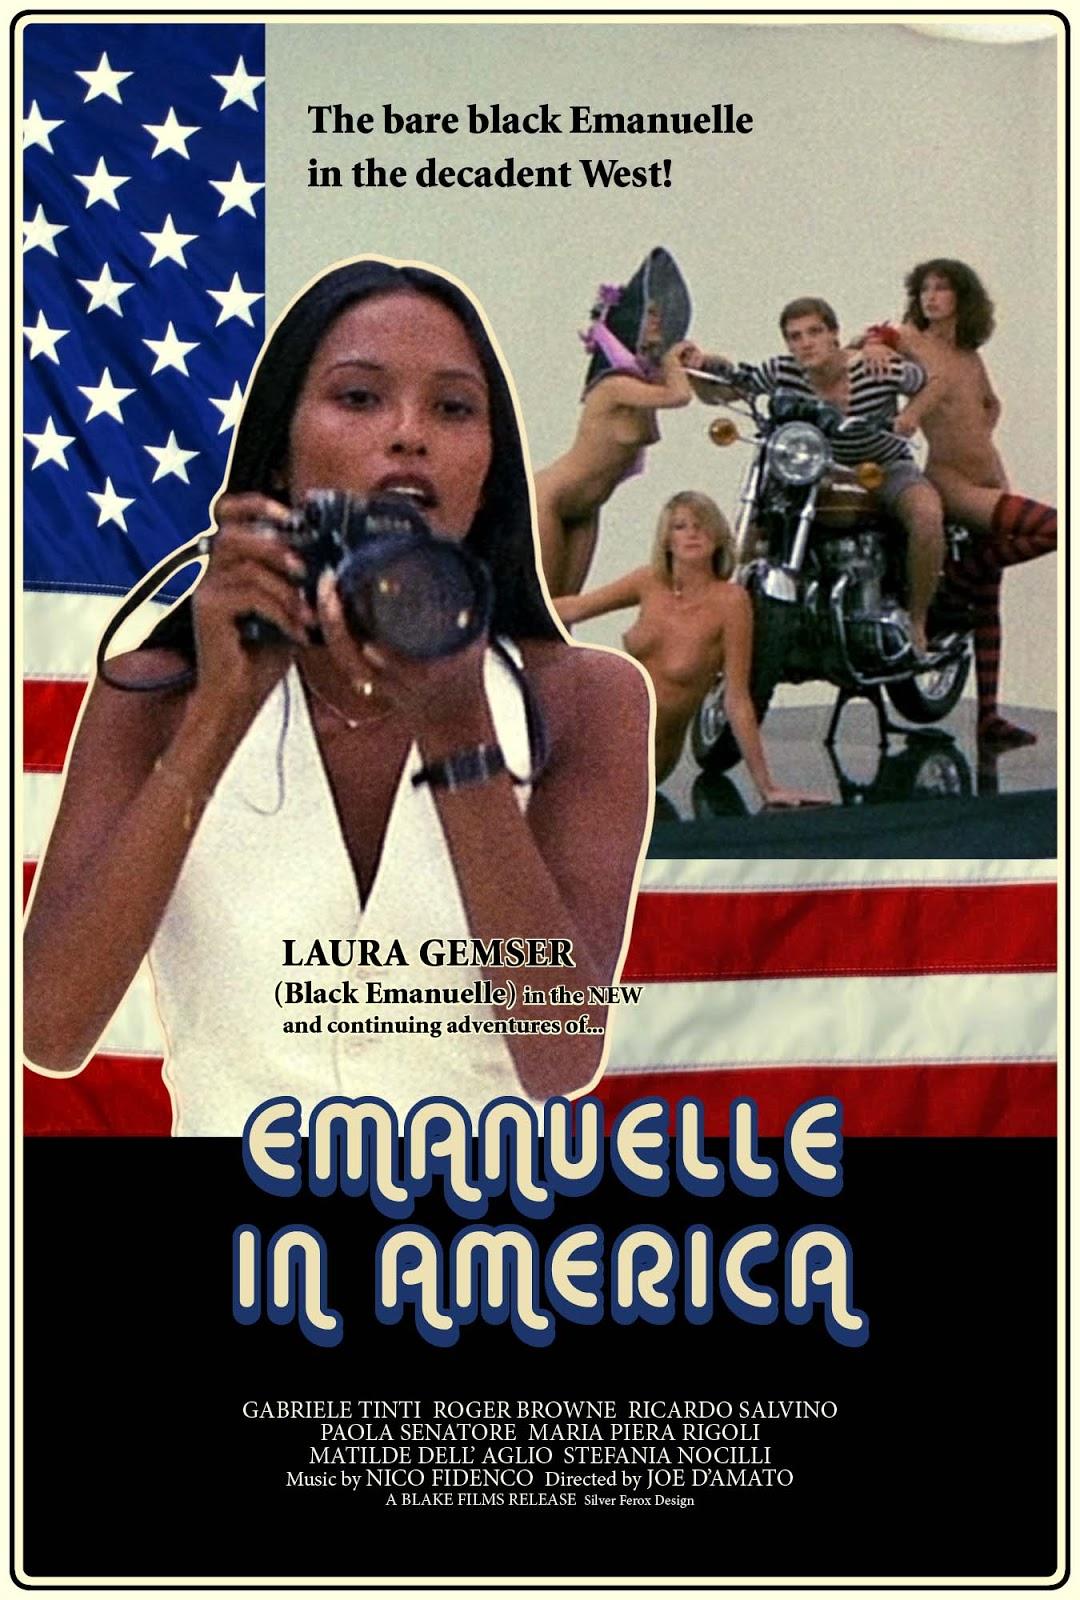 Paola Senatore emanuelle in america | emanuelle in america : office of film